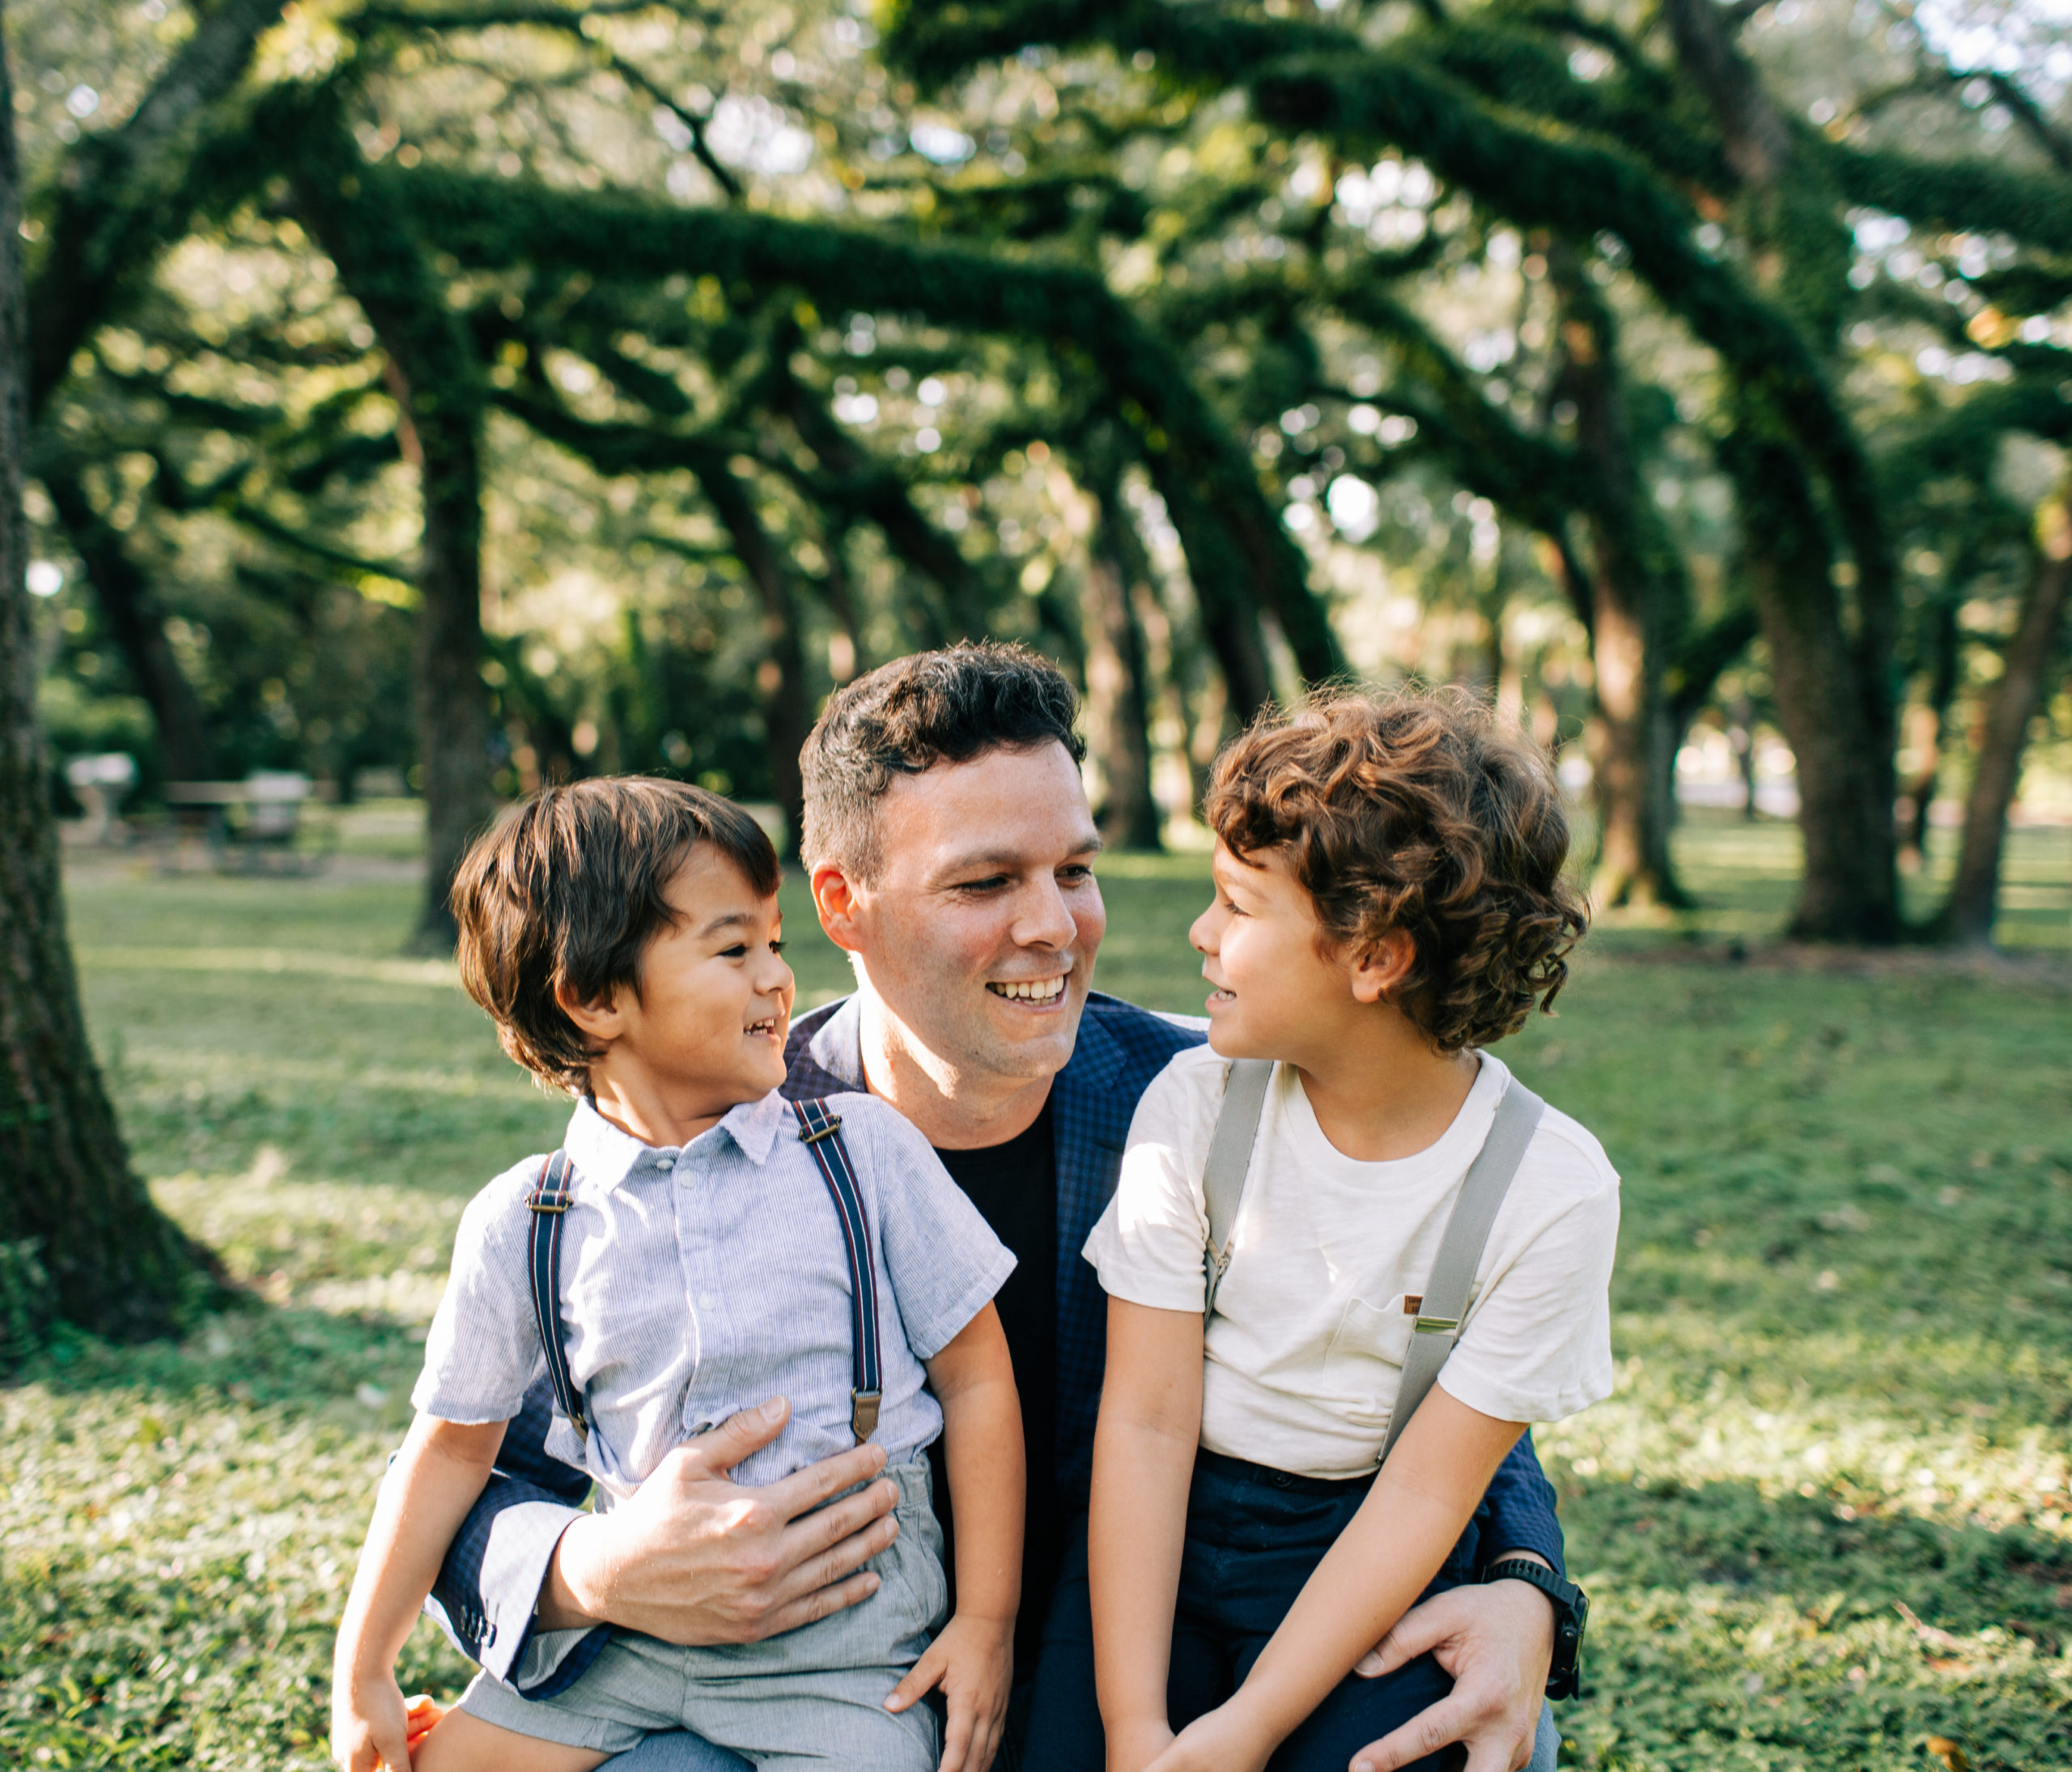 MiamiFamilyPhotoSession-3-scaled Family Photo Session at the Park - Villa Family